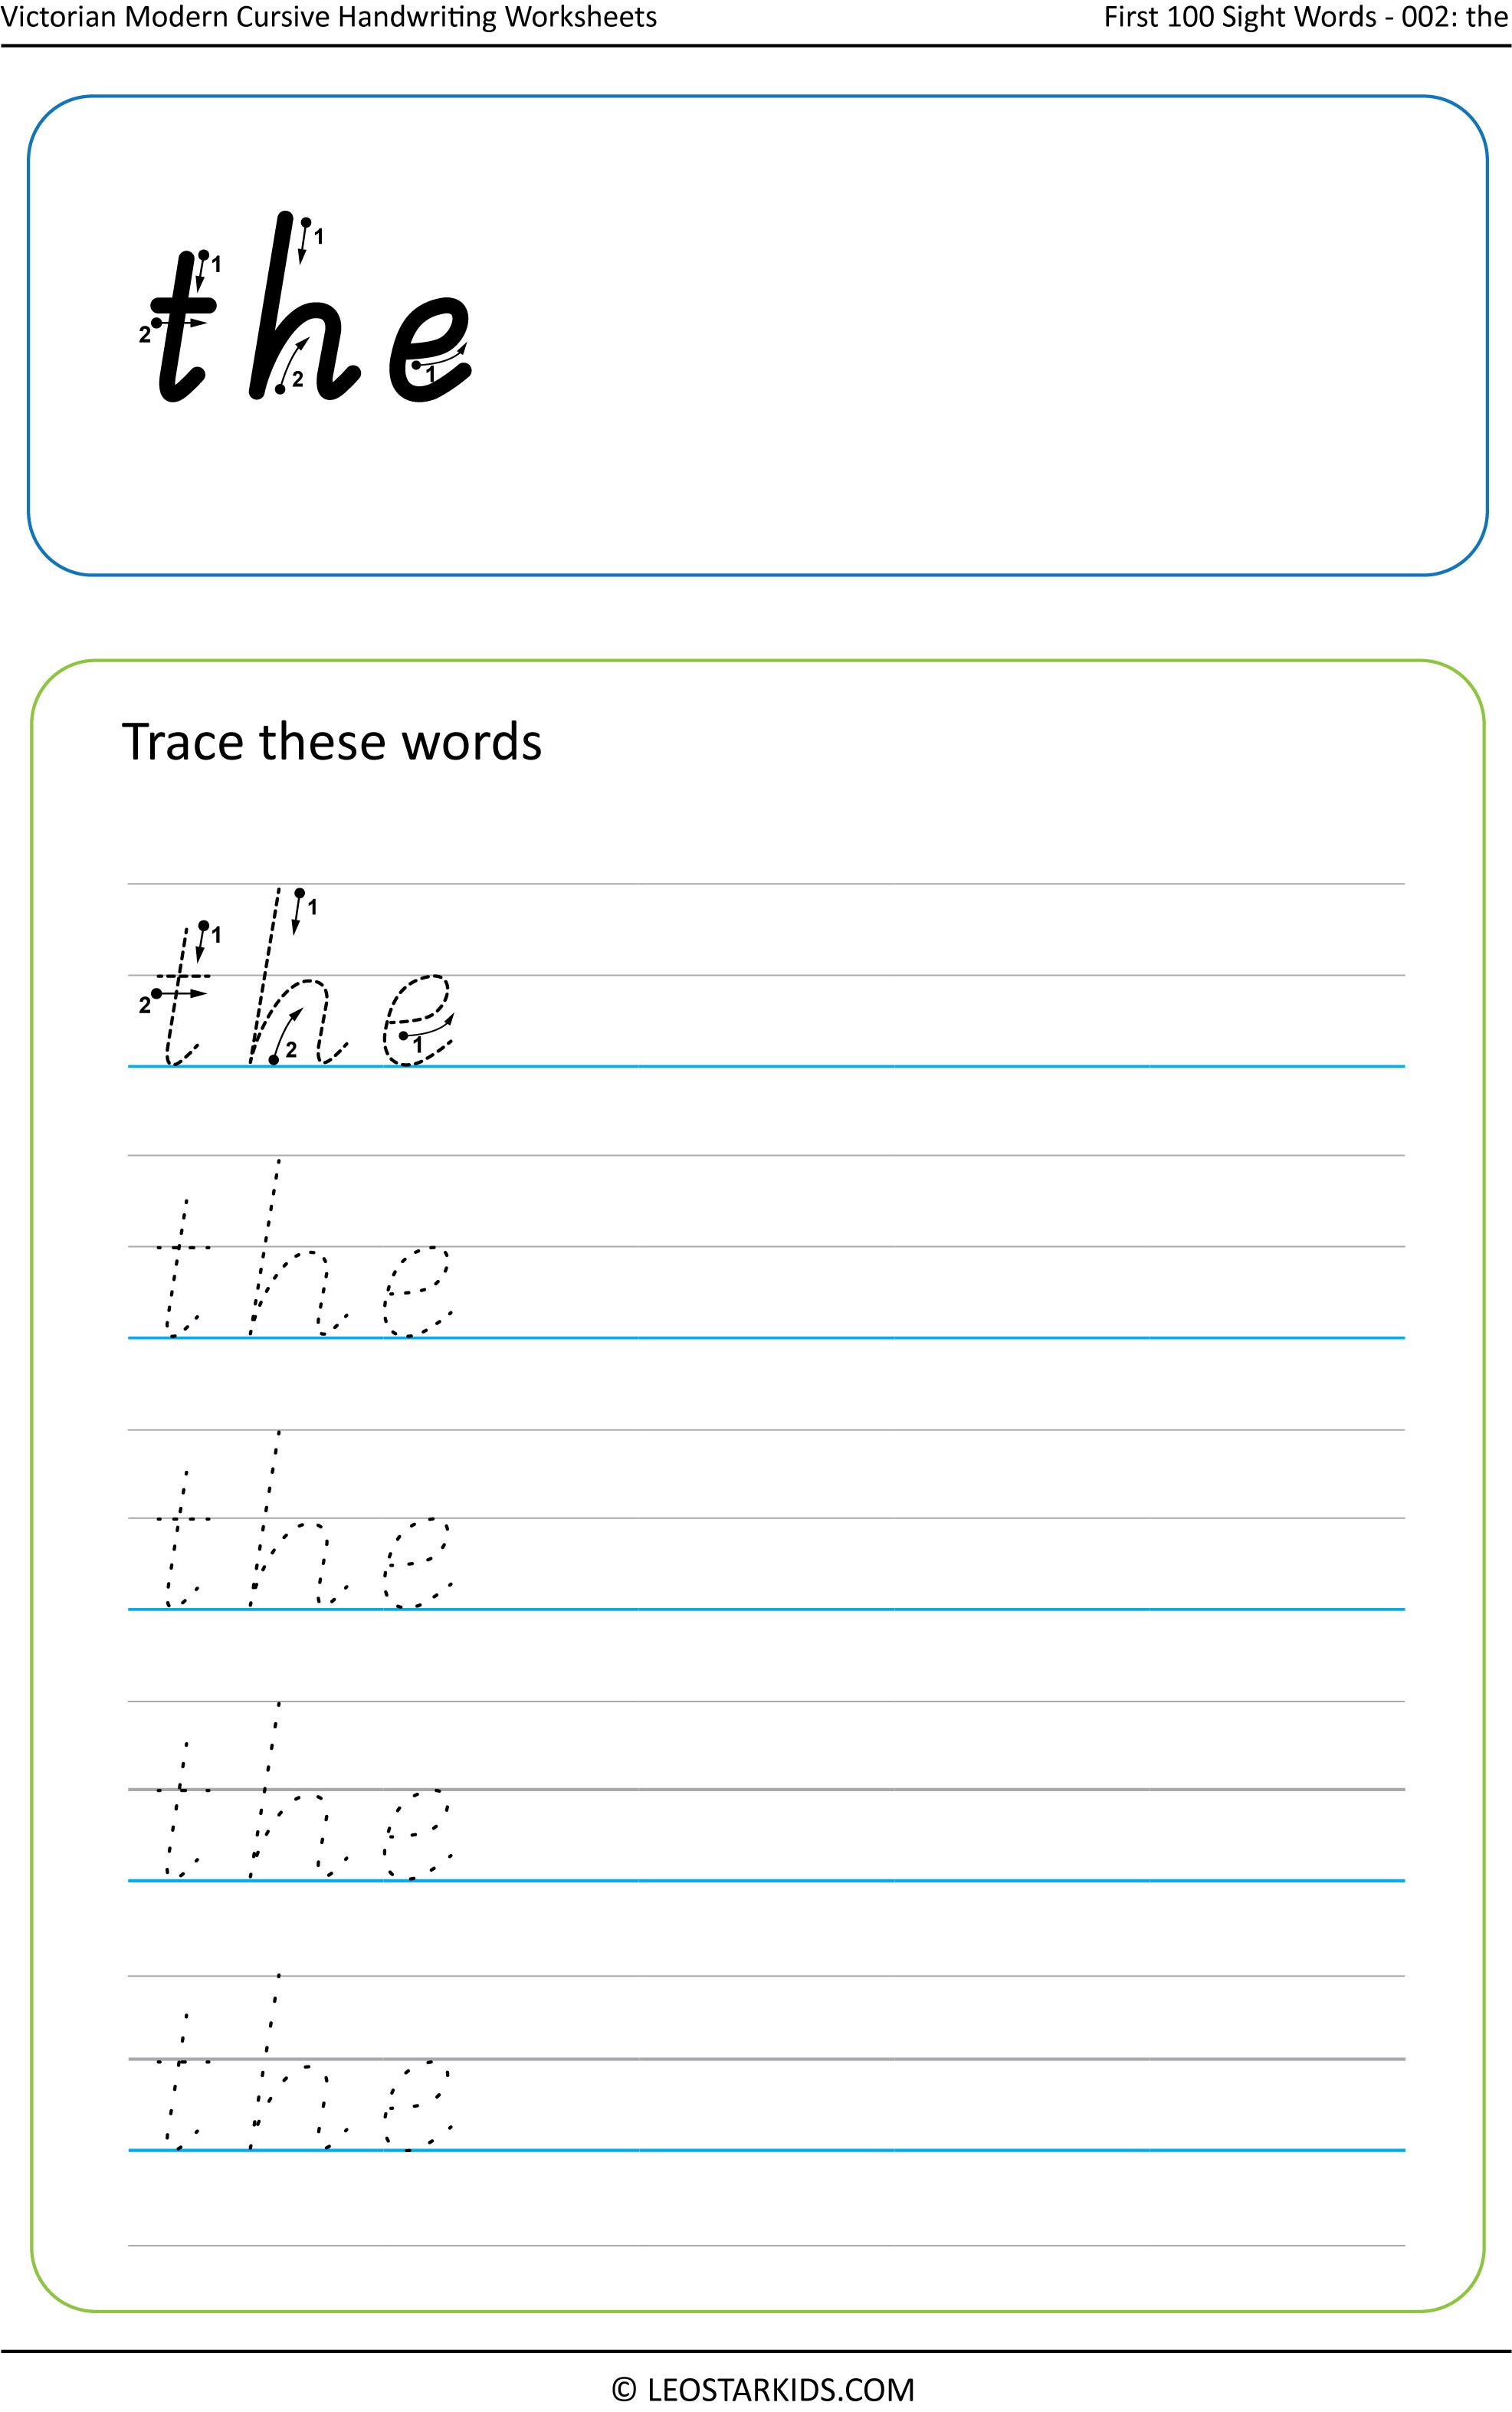 Australian Handwriting Worksheets Victorian Modern Cursive Sight Words Learning English For Kids Easy Crafts For Teens Kindergarten Classroom Organization [ 3147 x 1973 Pixel ]